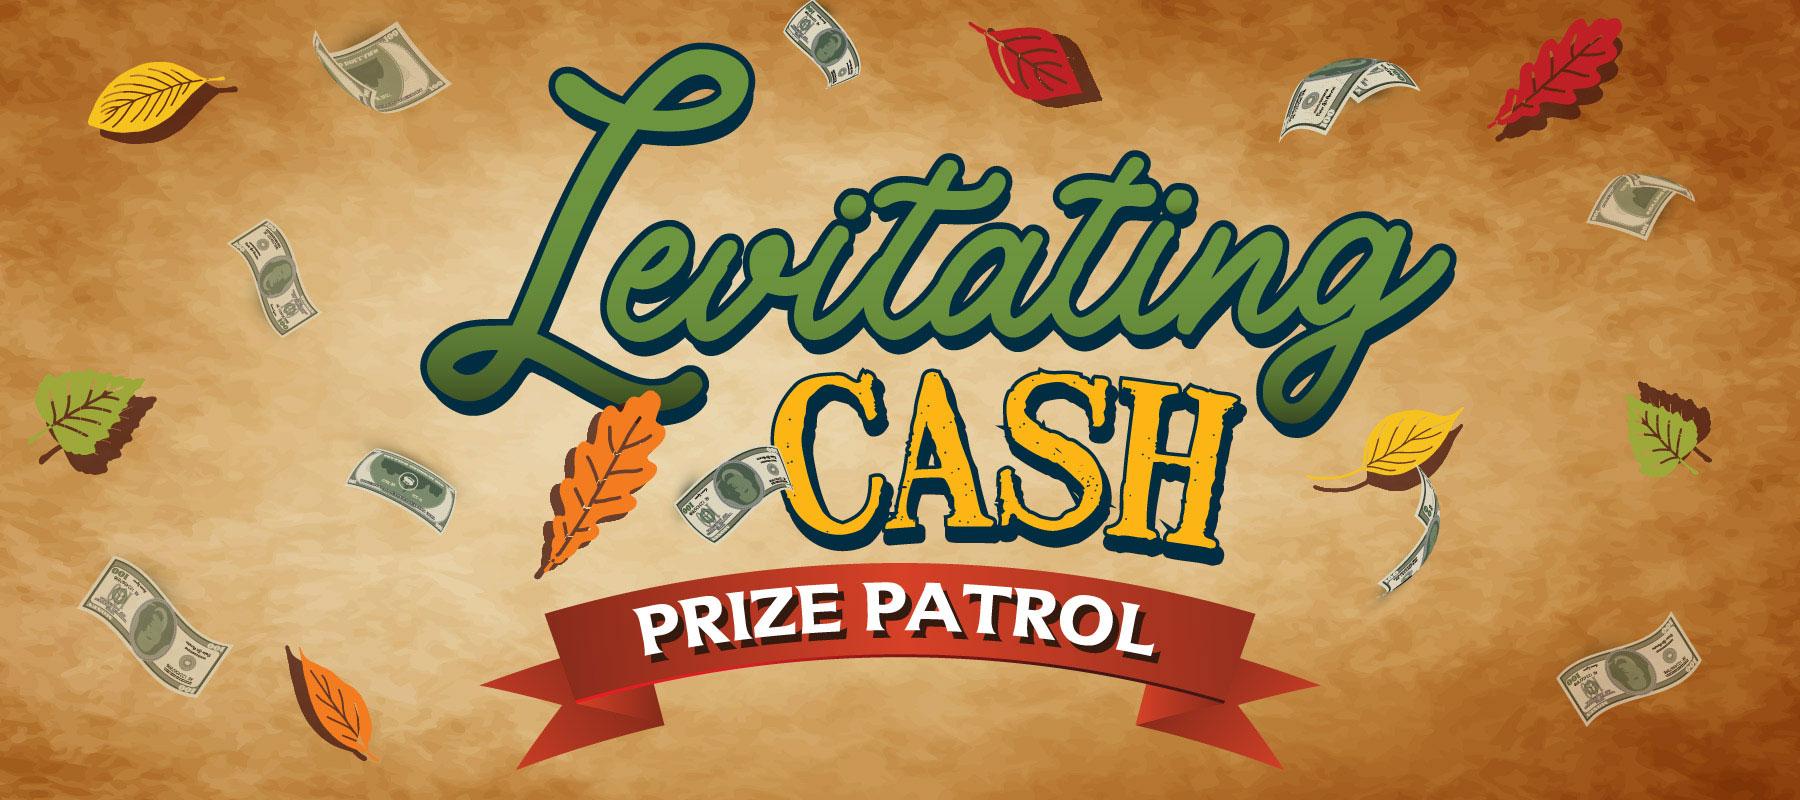 Levitating Cash Prize Patrol